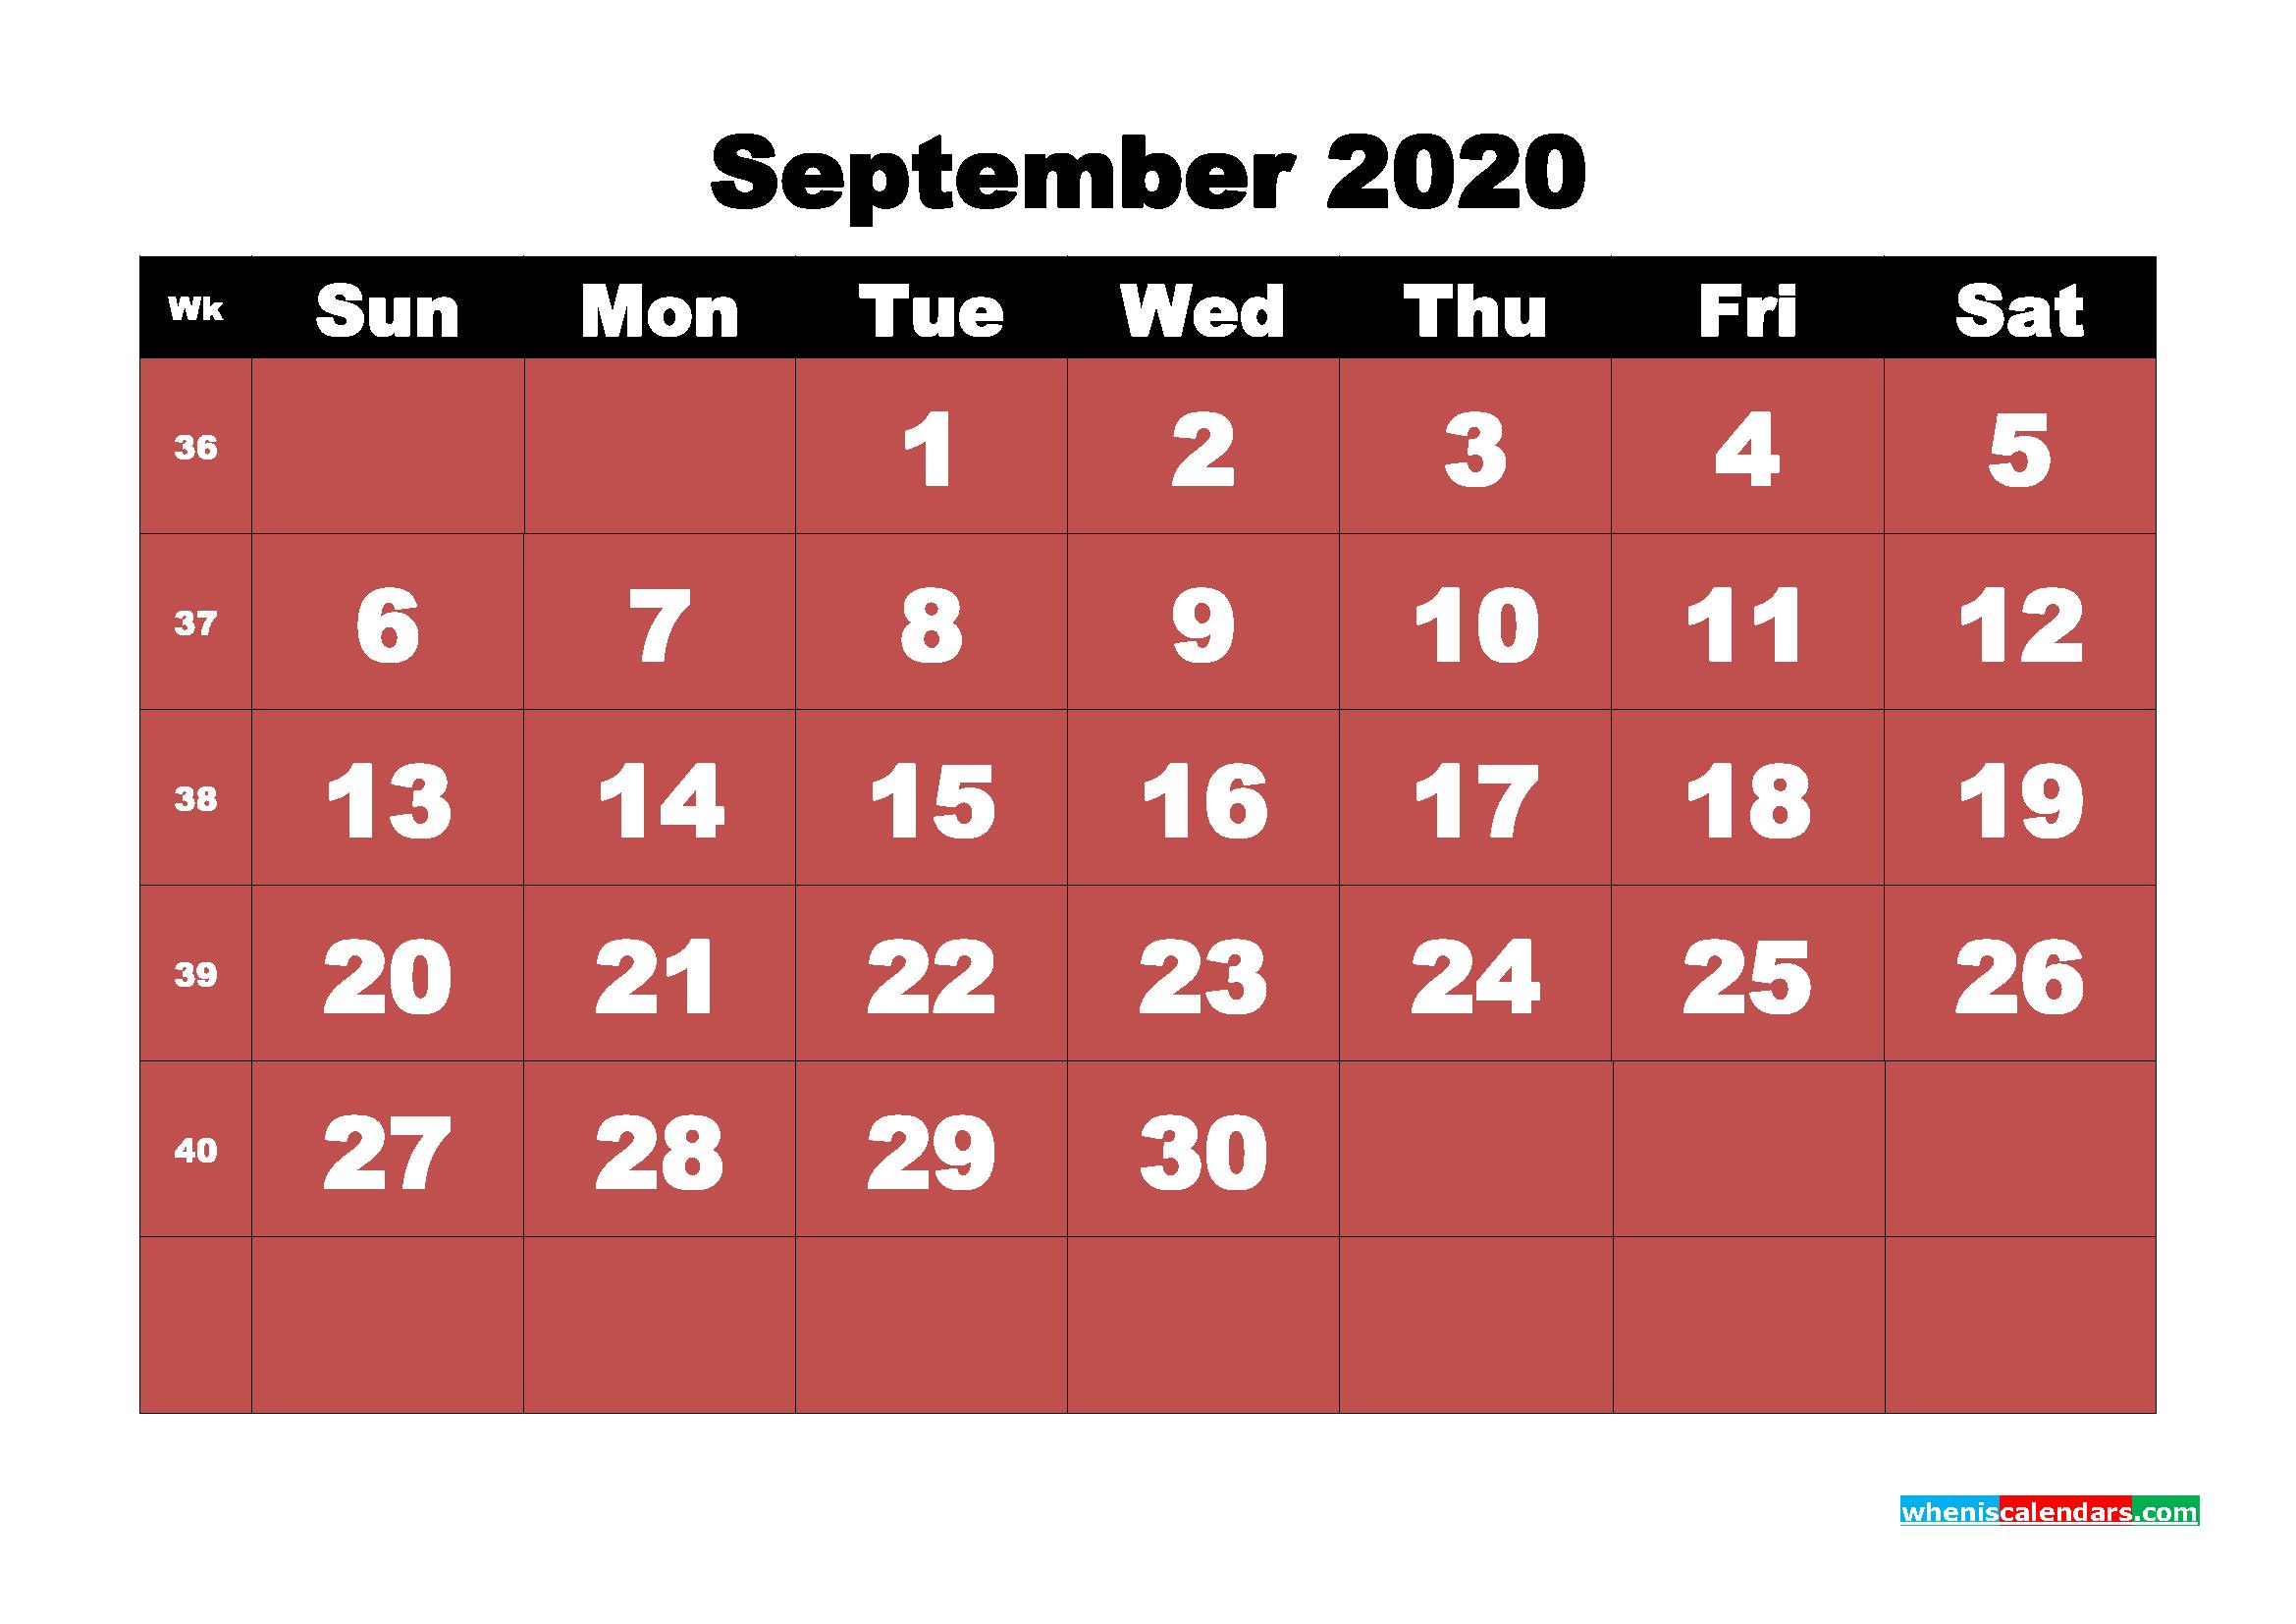 September Printable Calendar 2020 PDF, Word - No.m20b21